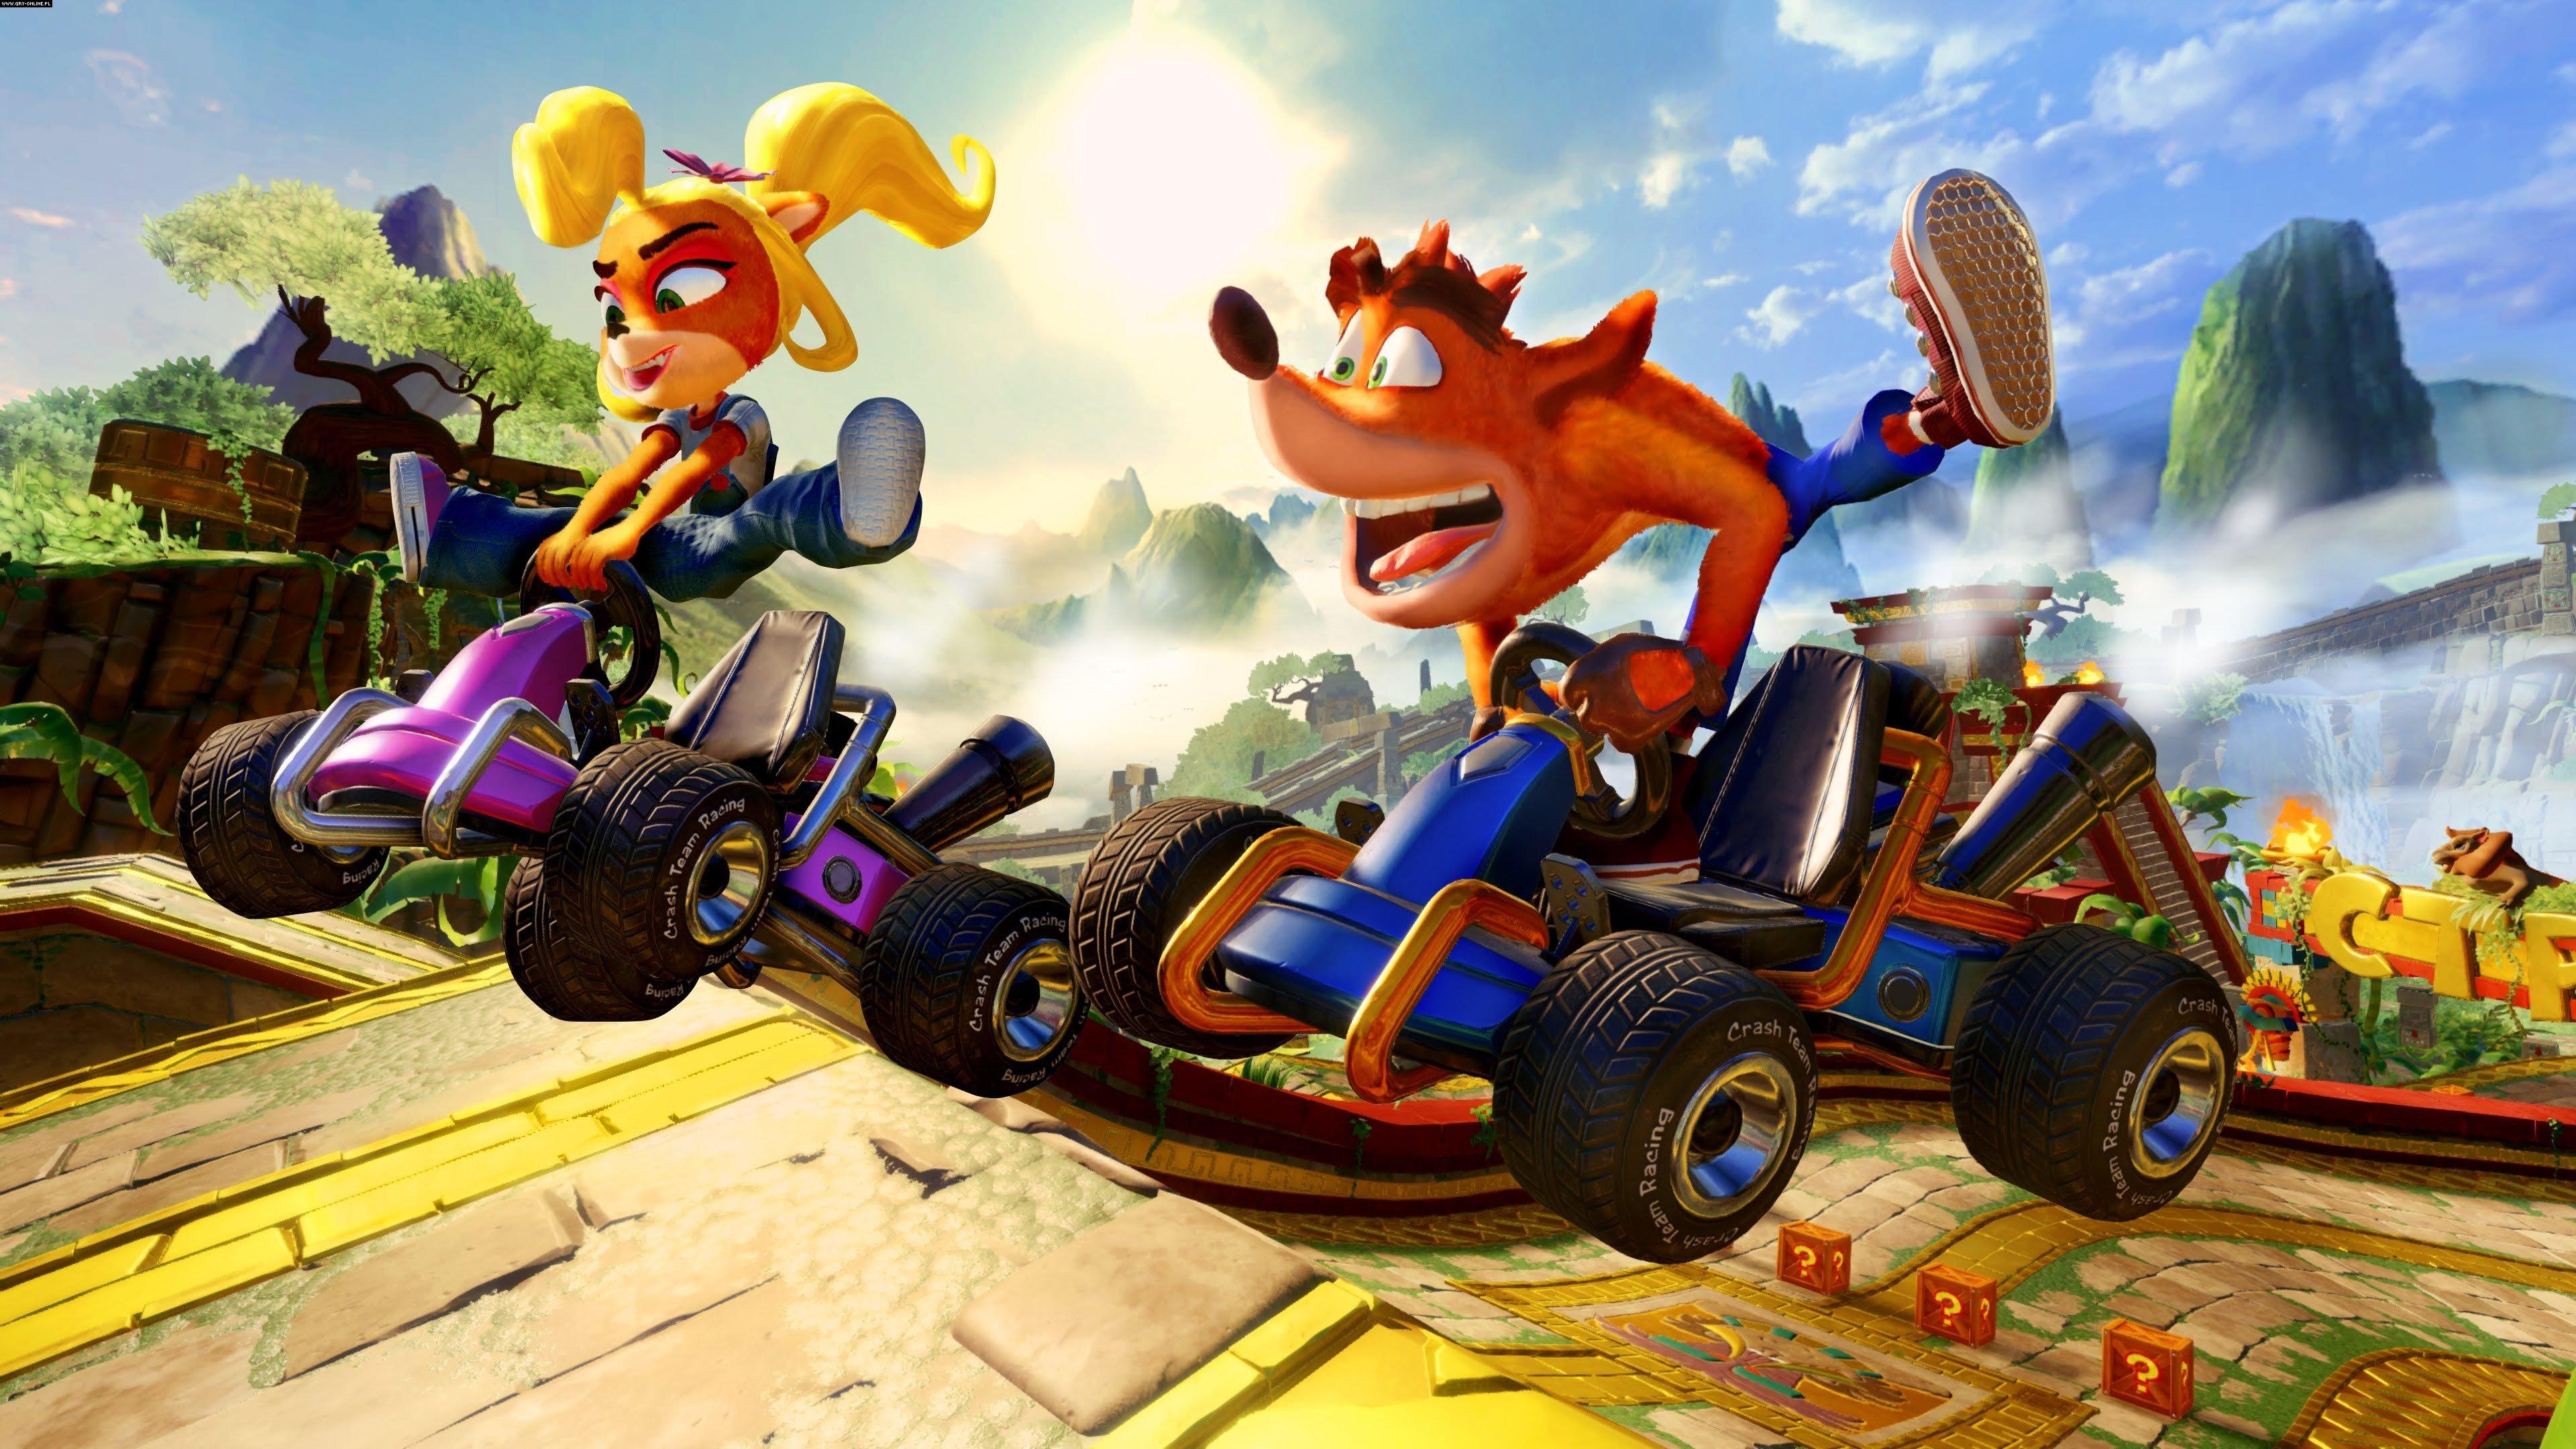 Crash Team Racing Nitro-Fueled PS4 Games Image 9/24, Beenox Inc., Activision Blizzard